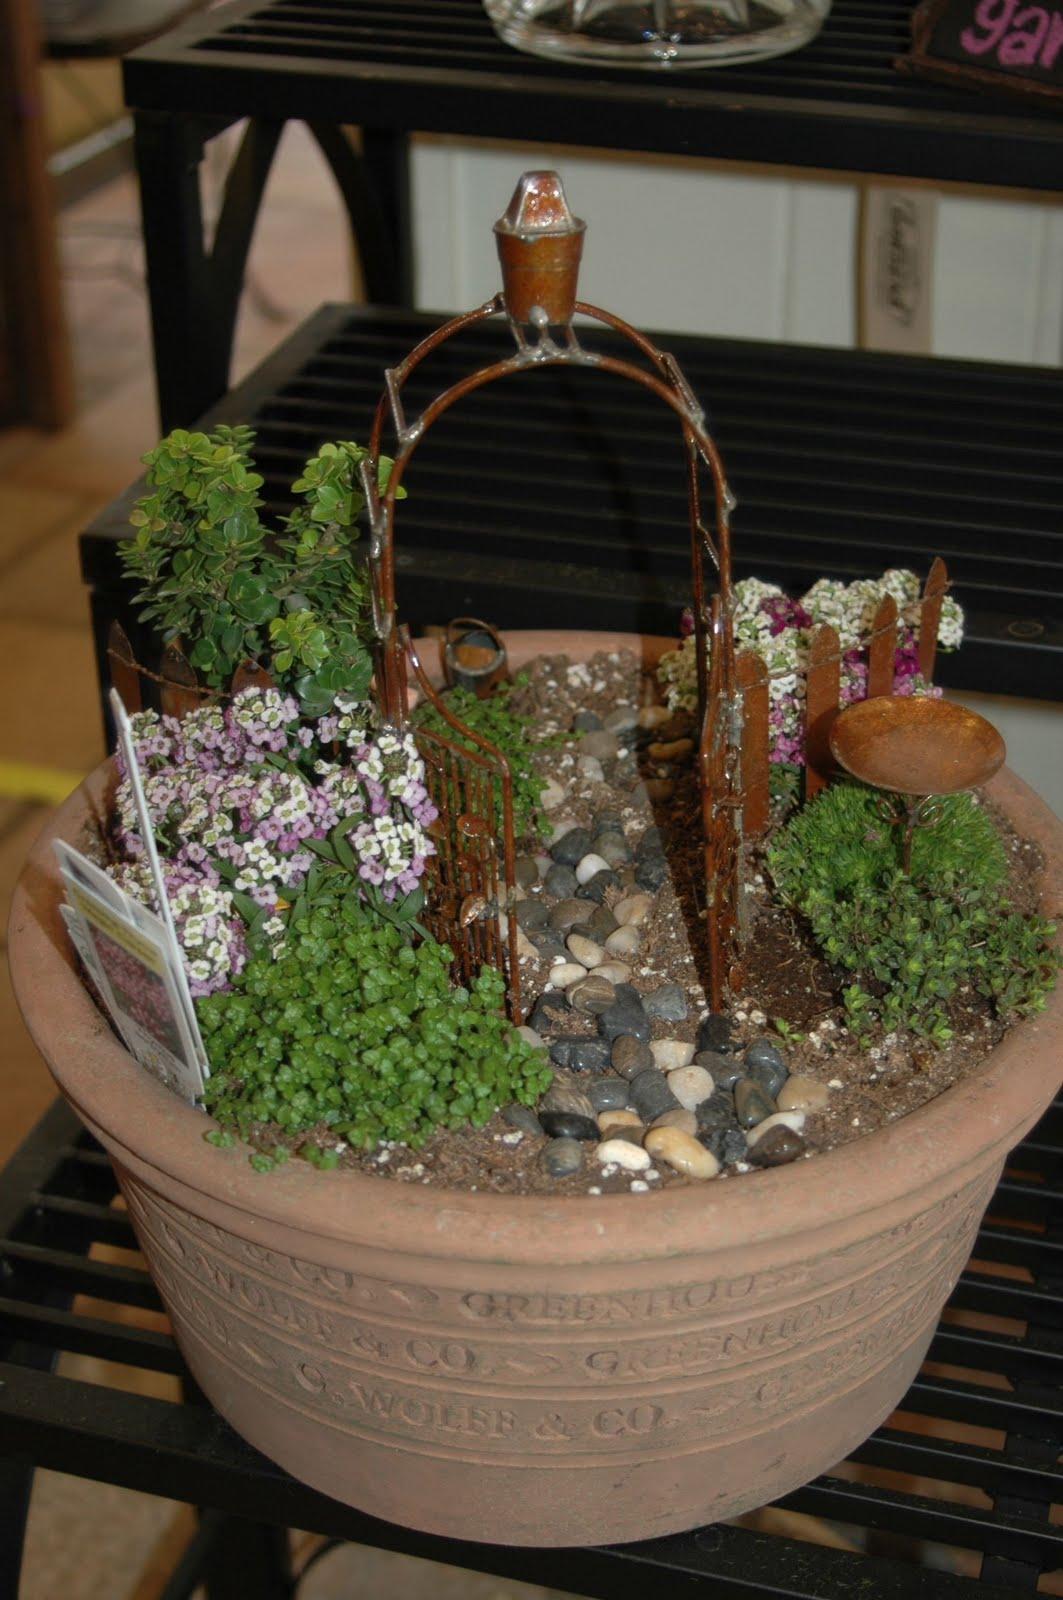 Pamela smerker designs creek side gardens photo shoot - Fairy garden containers ...